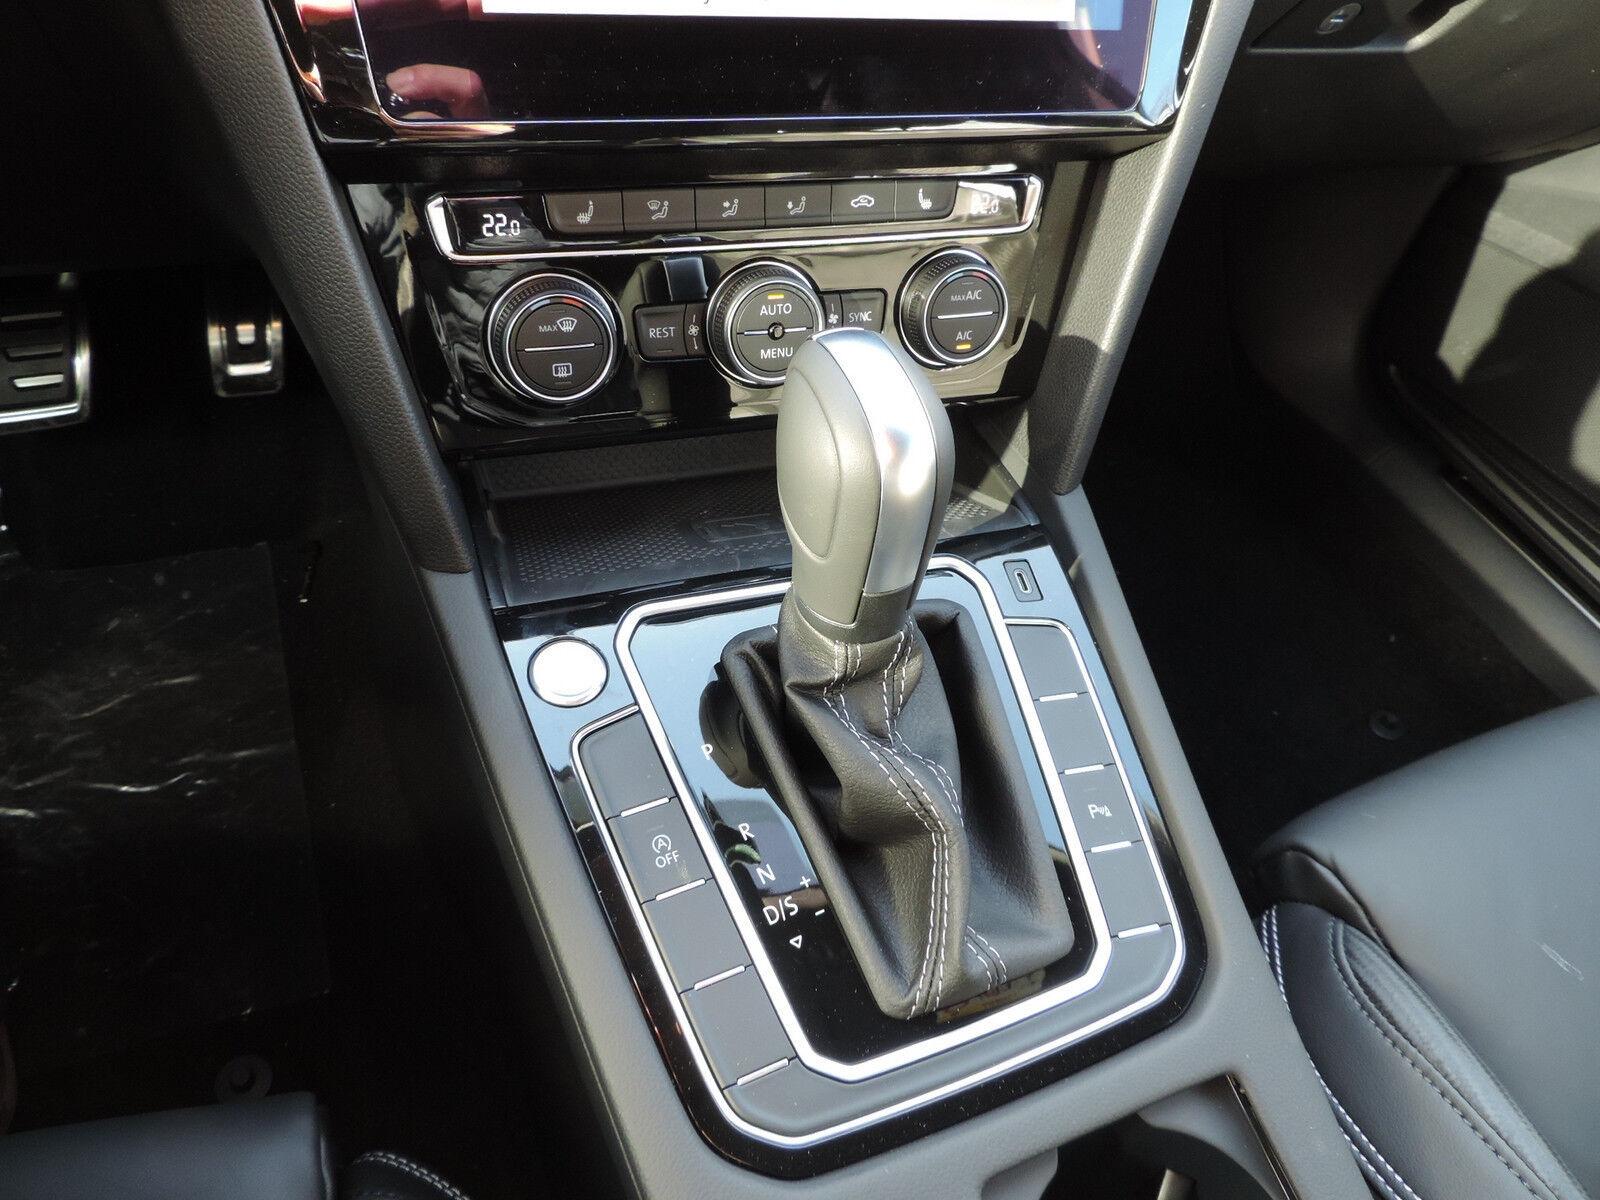 Volkswagen Passat Variant 2.0 TSI R-Line DSG CUIR GPS ACC LANE NEUVE 13/15